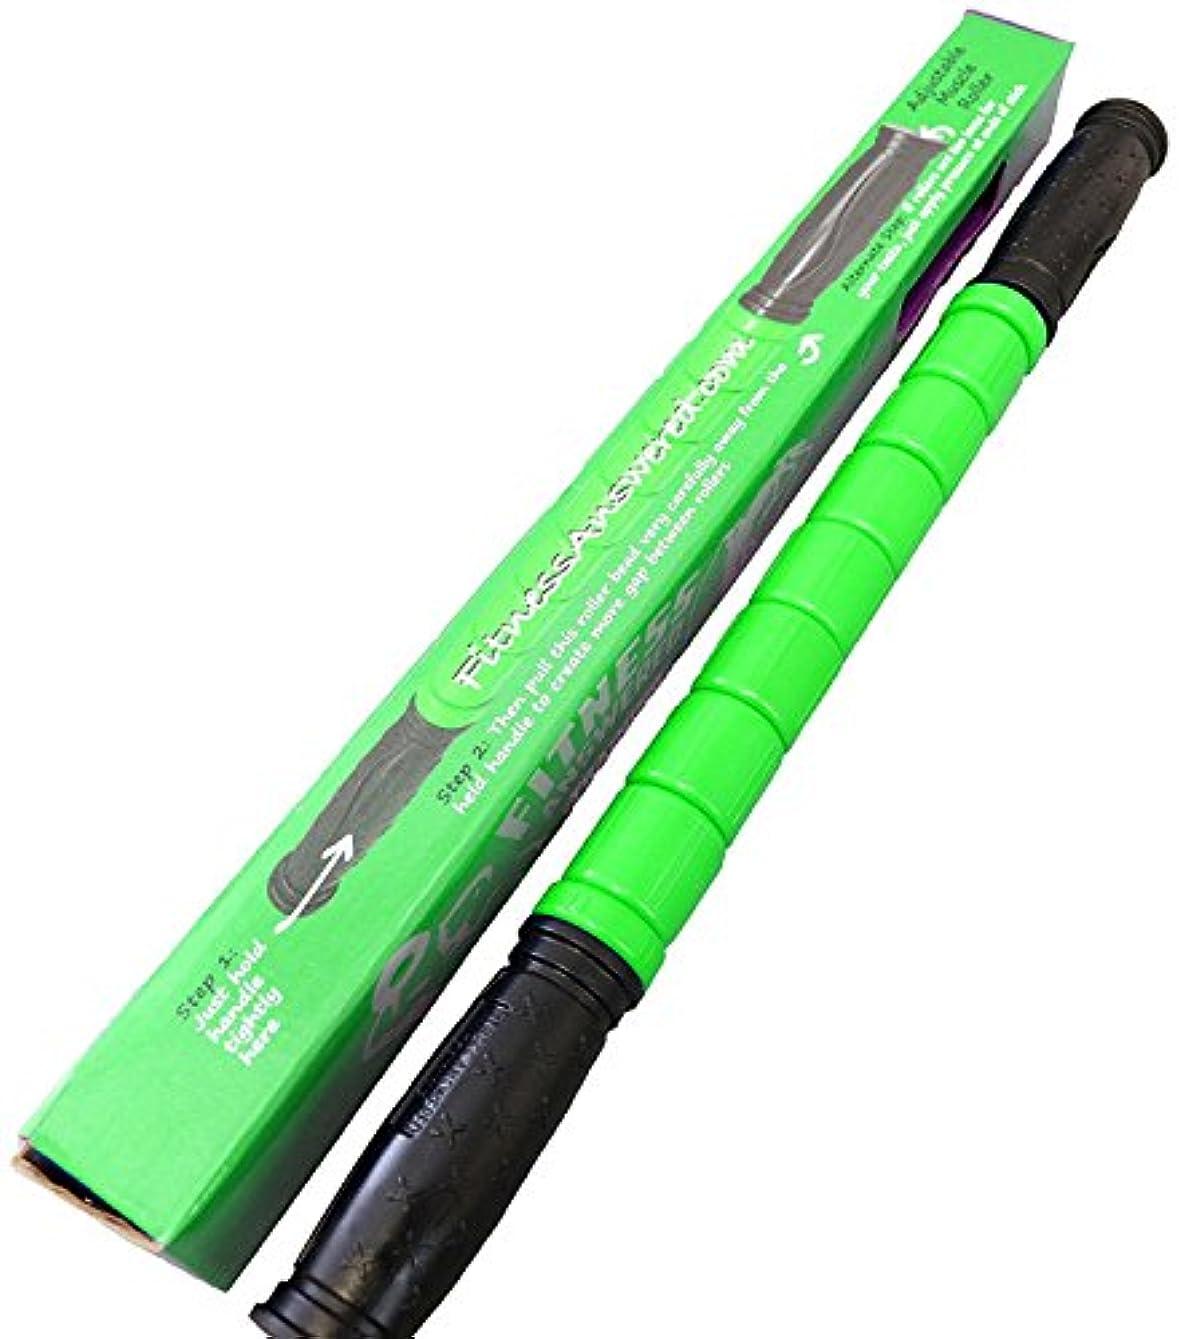 The Muscle Stick - 18 Only Adjustable Handle Massage Roller - Better Than Foam Roller - Best Deep Tissue - Trigger...